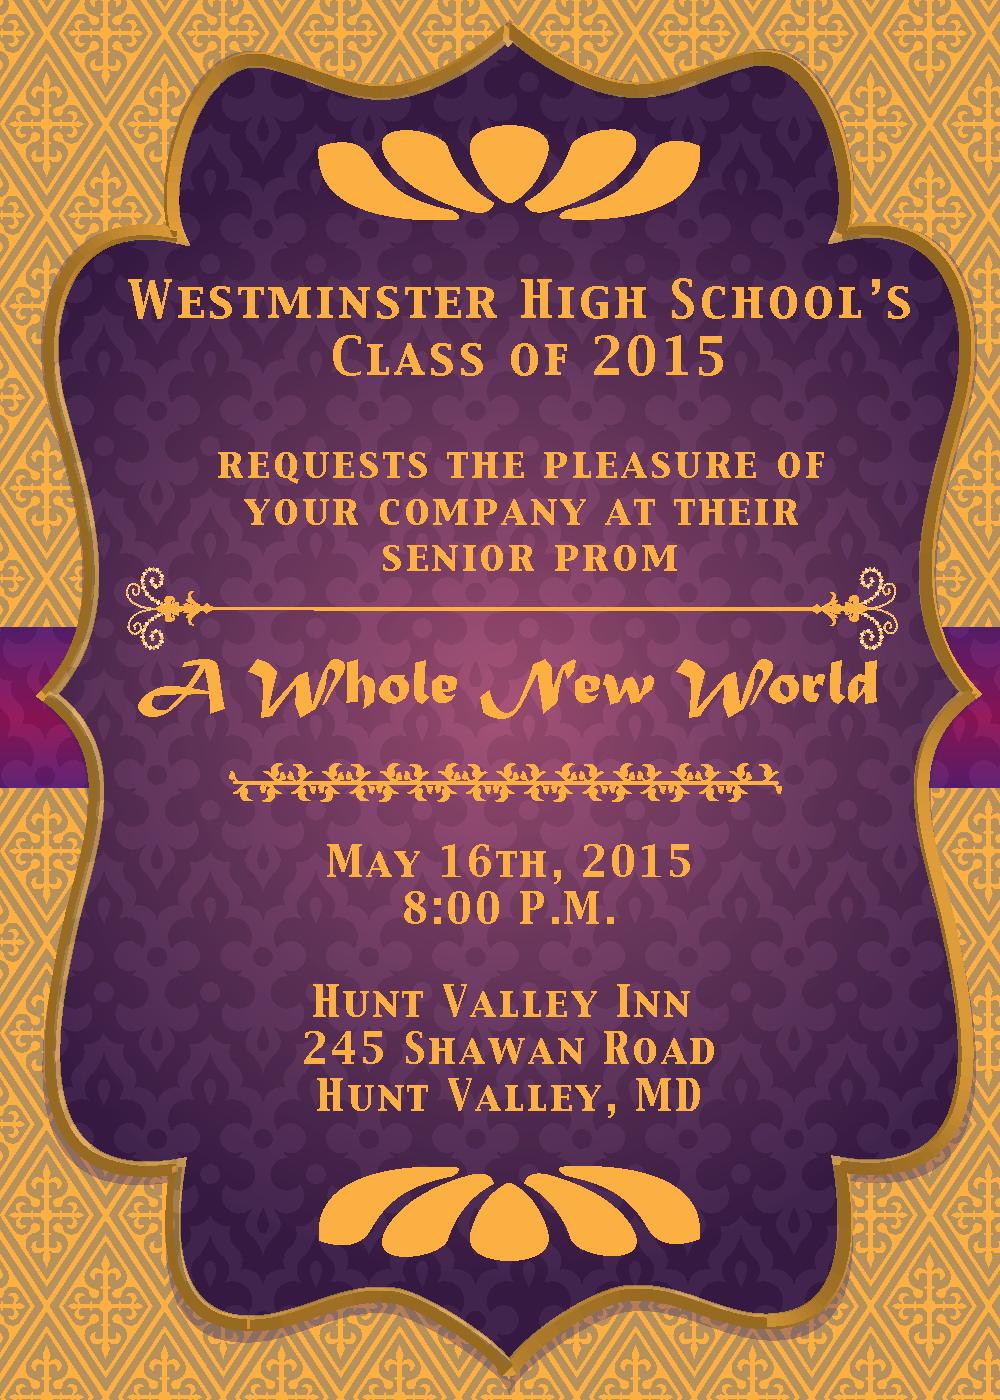 Senior_Prom_Invitation.png